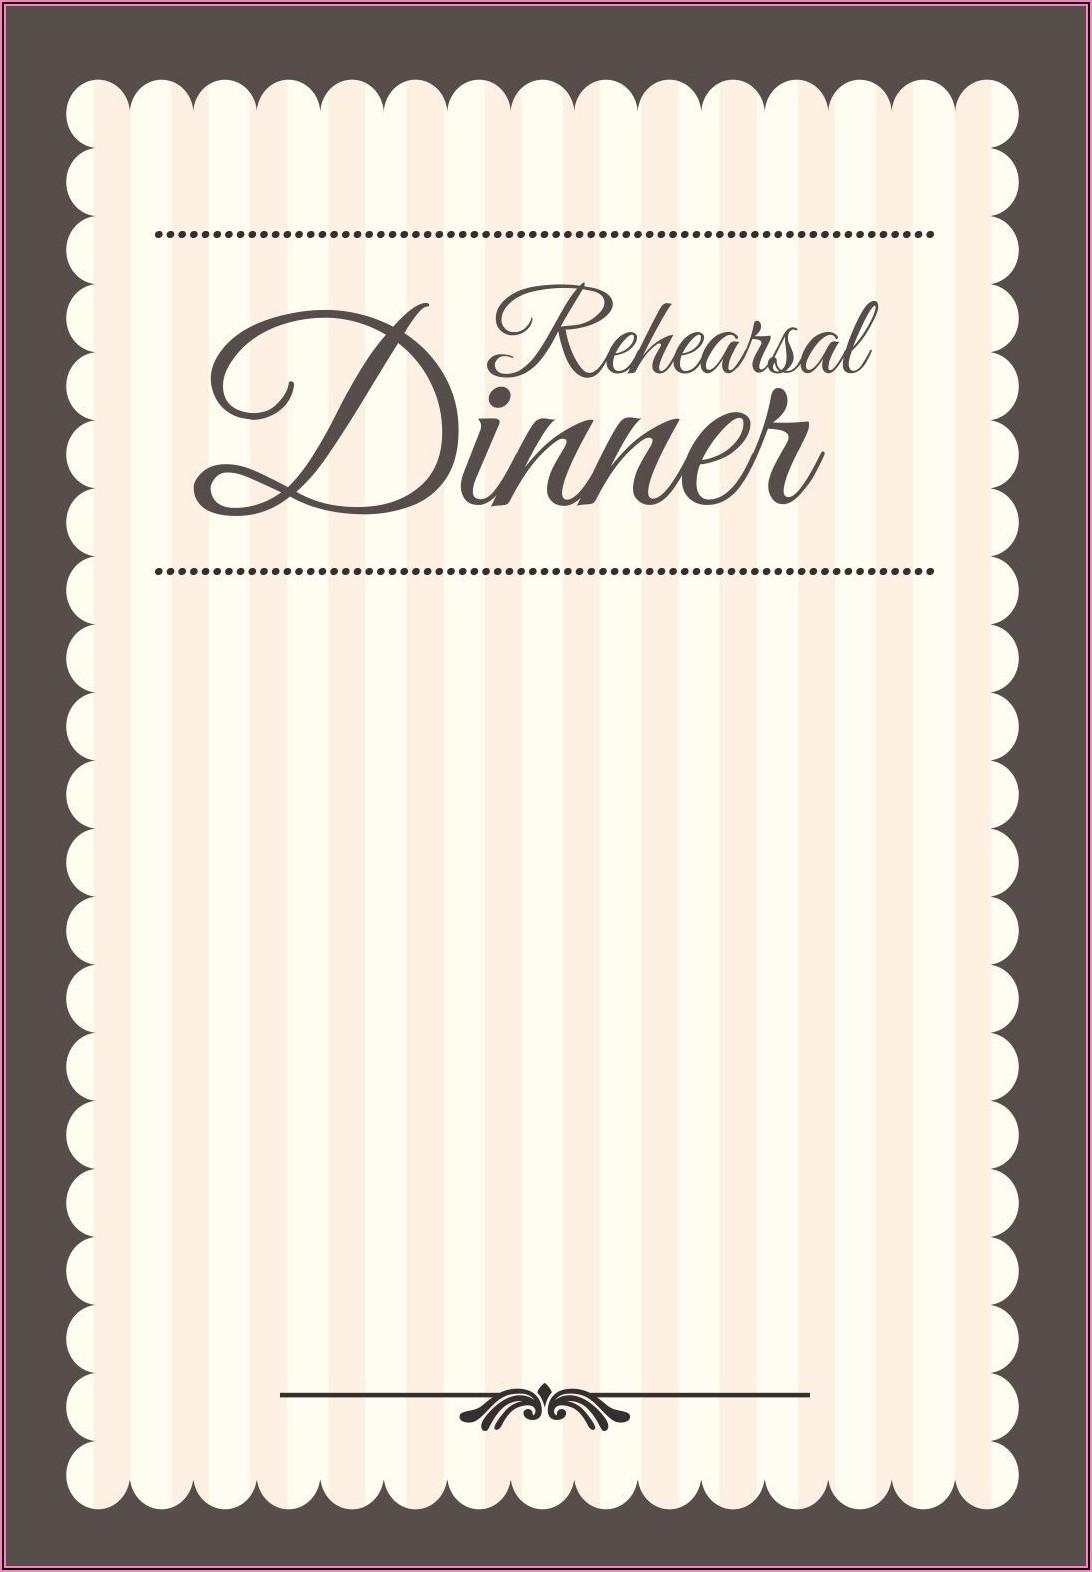 Rehearsal Dinner Invitation Template Printable Free